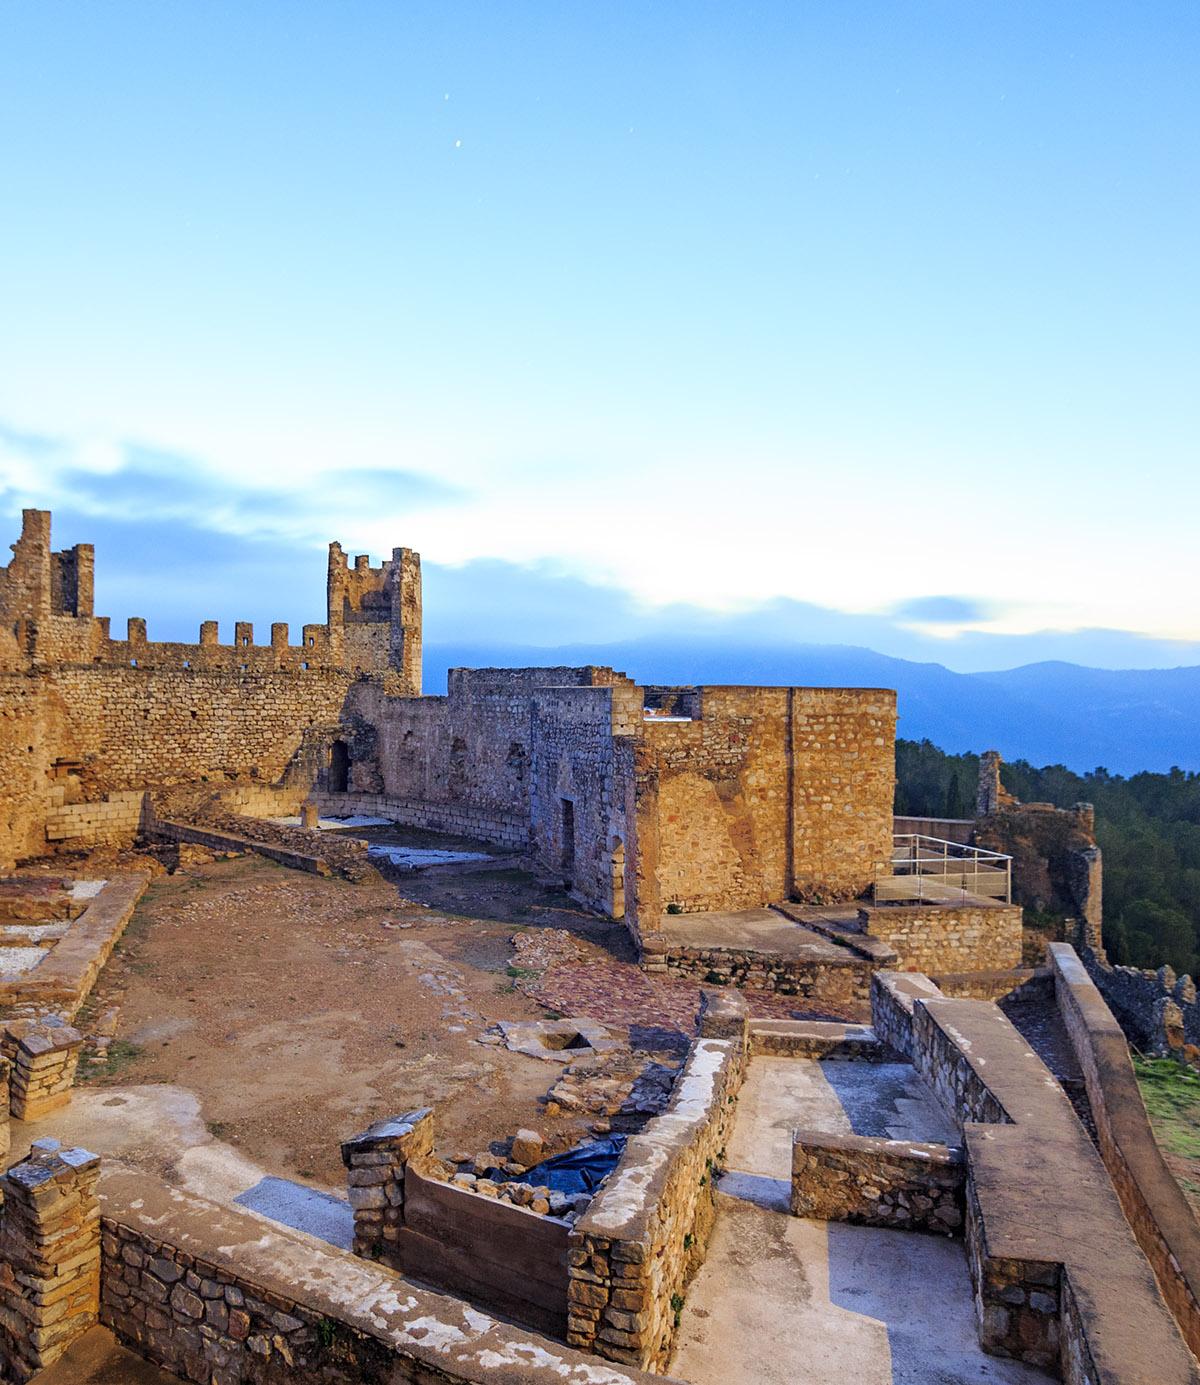 patrimonio-culltural-castillo-de-xivert